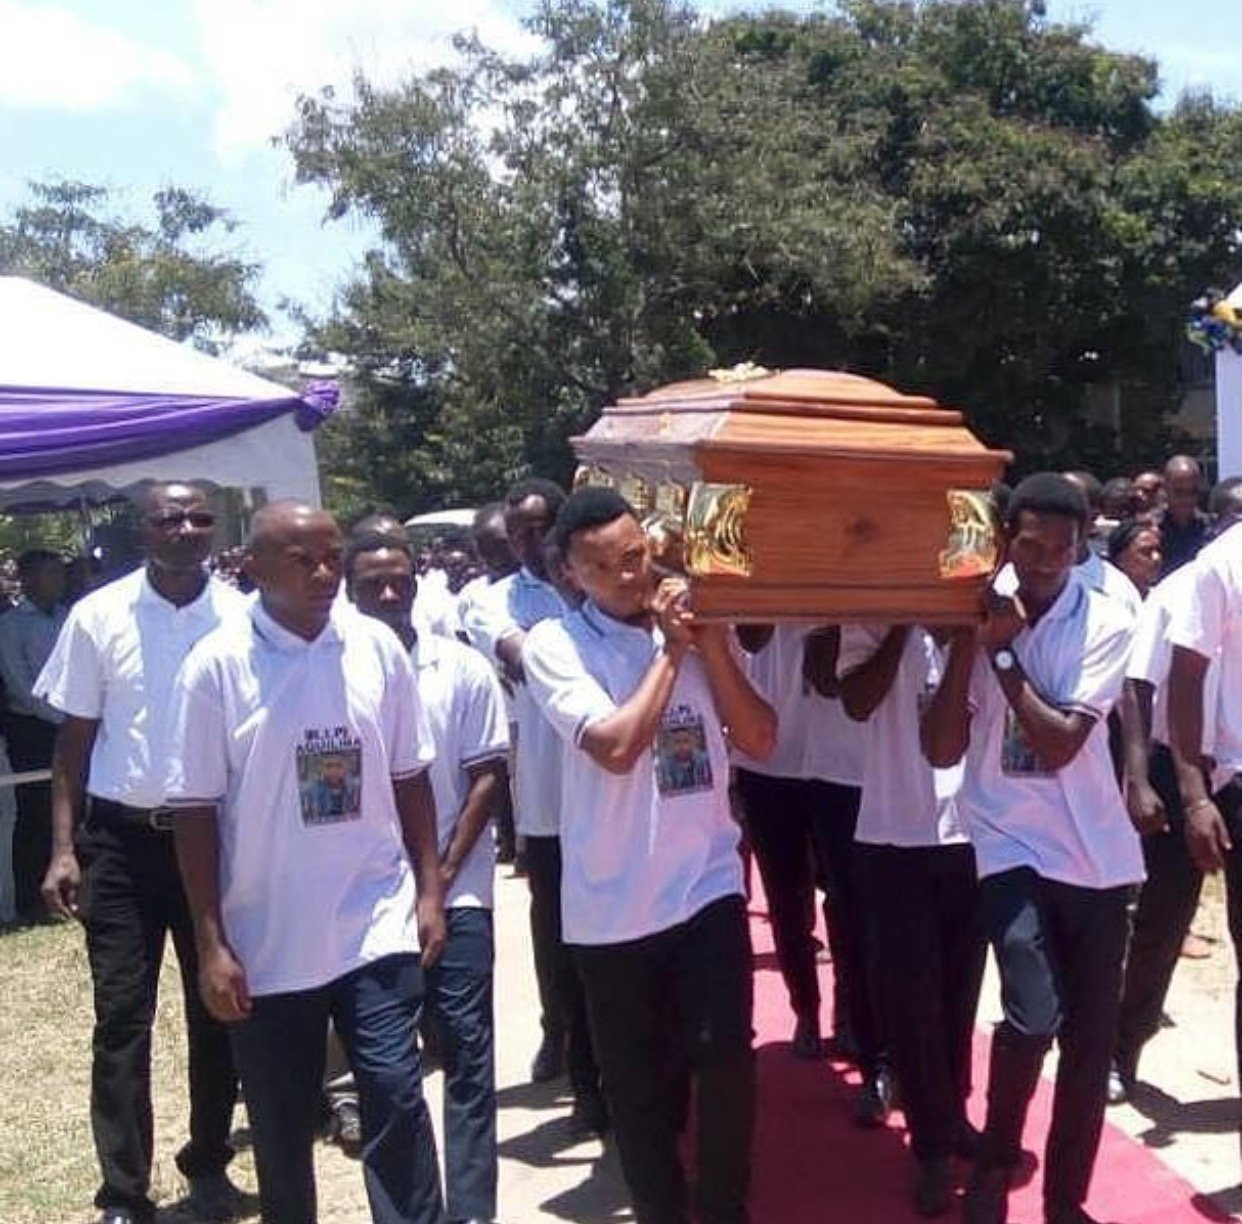 University student Akwilina Akwilini shot dead by a police man finally laid to rest